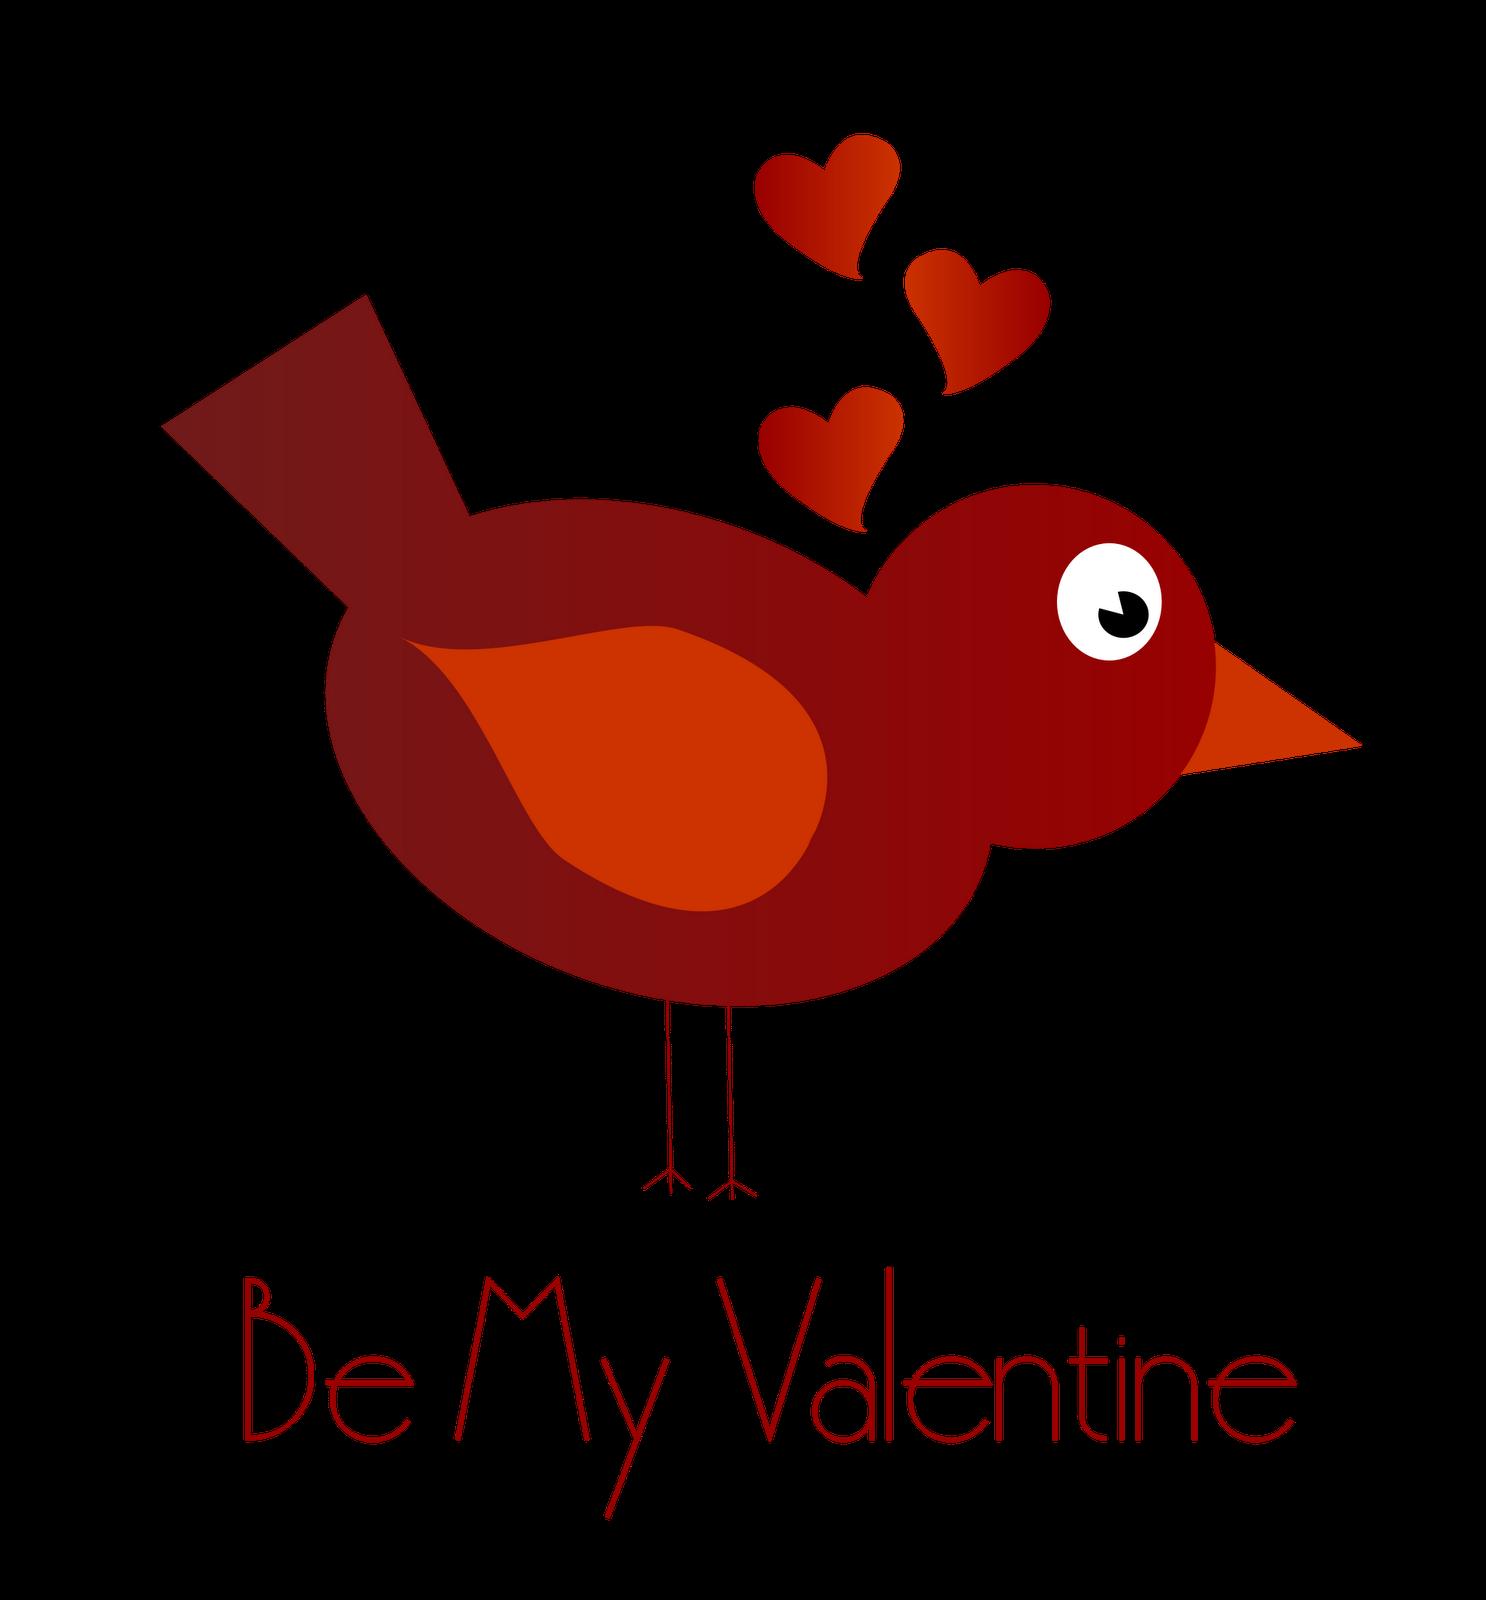 sweet bambinos: Happy Valentine's Day!